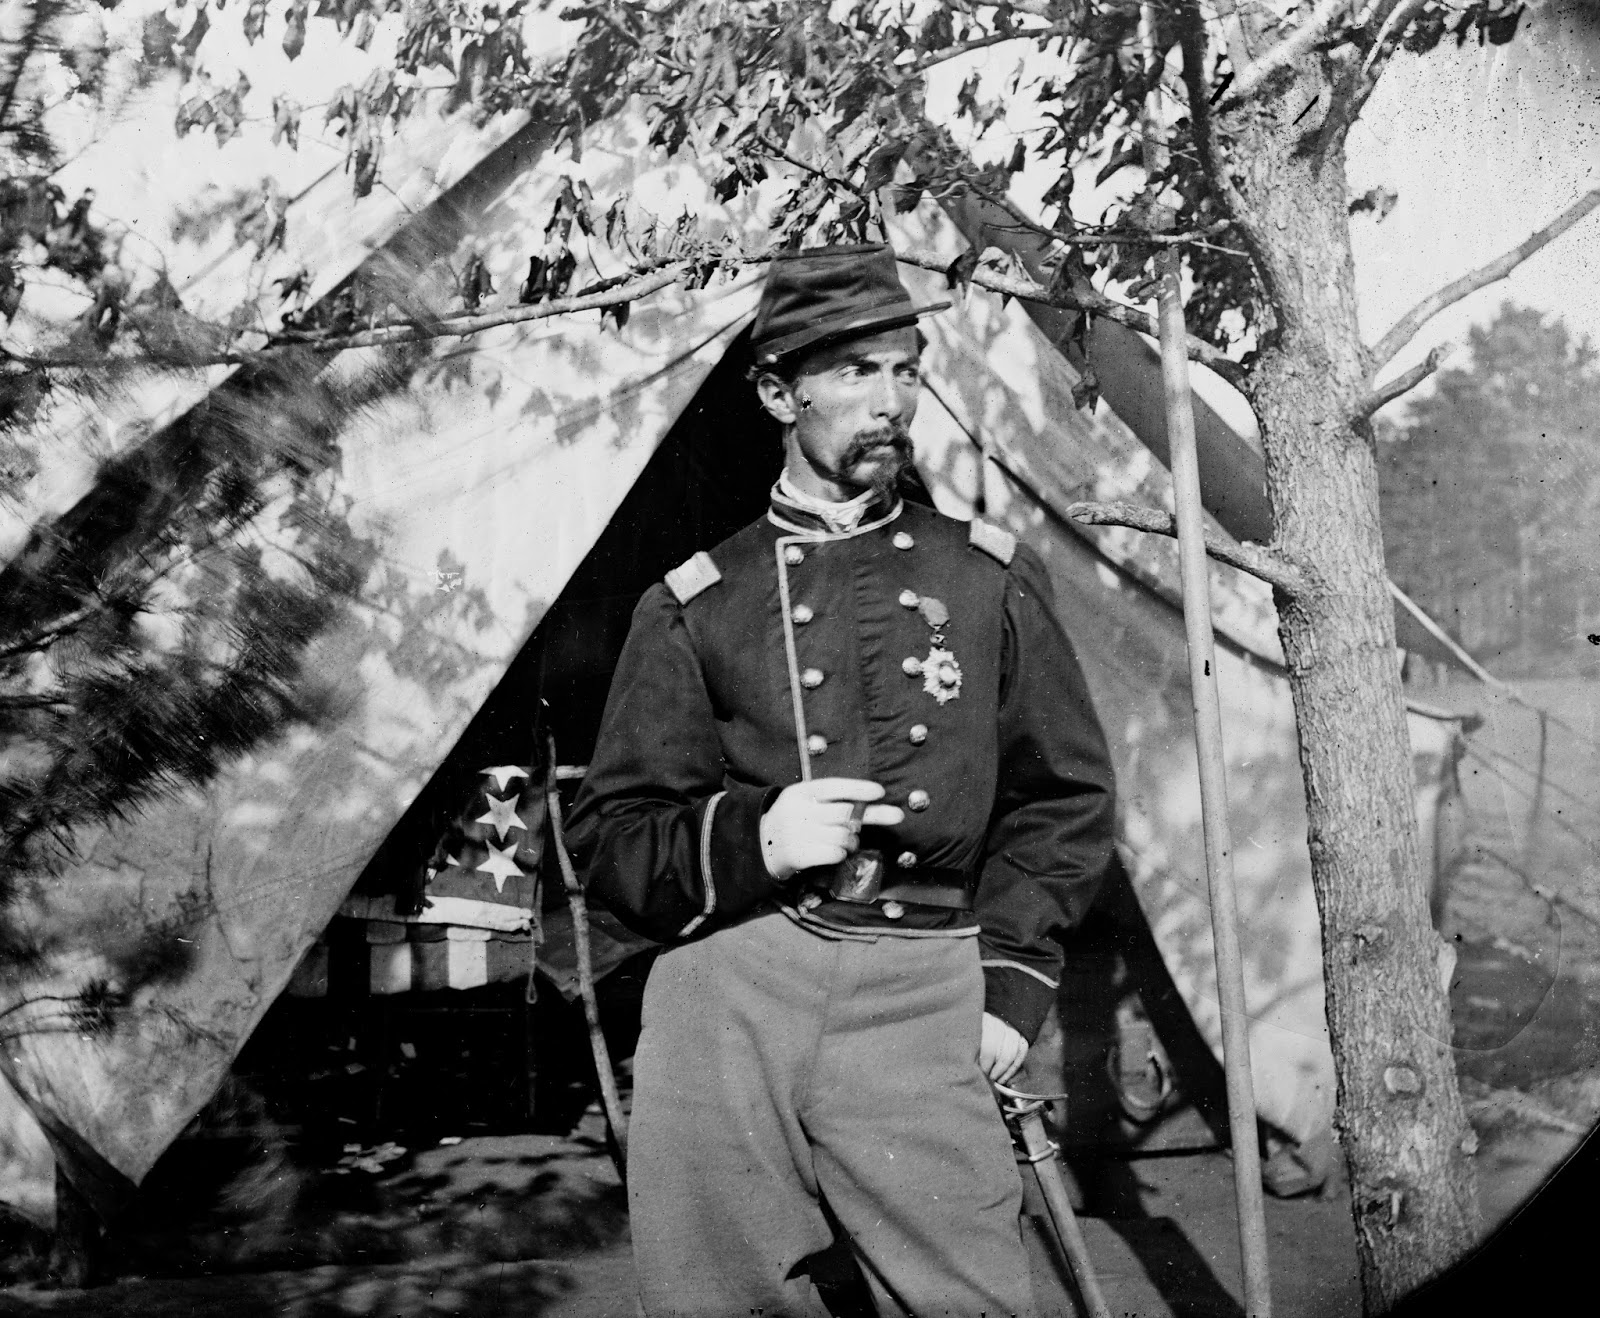 WarBetweenTheStates Civil War Photography Subreddit